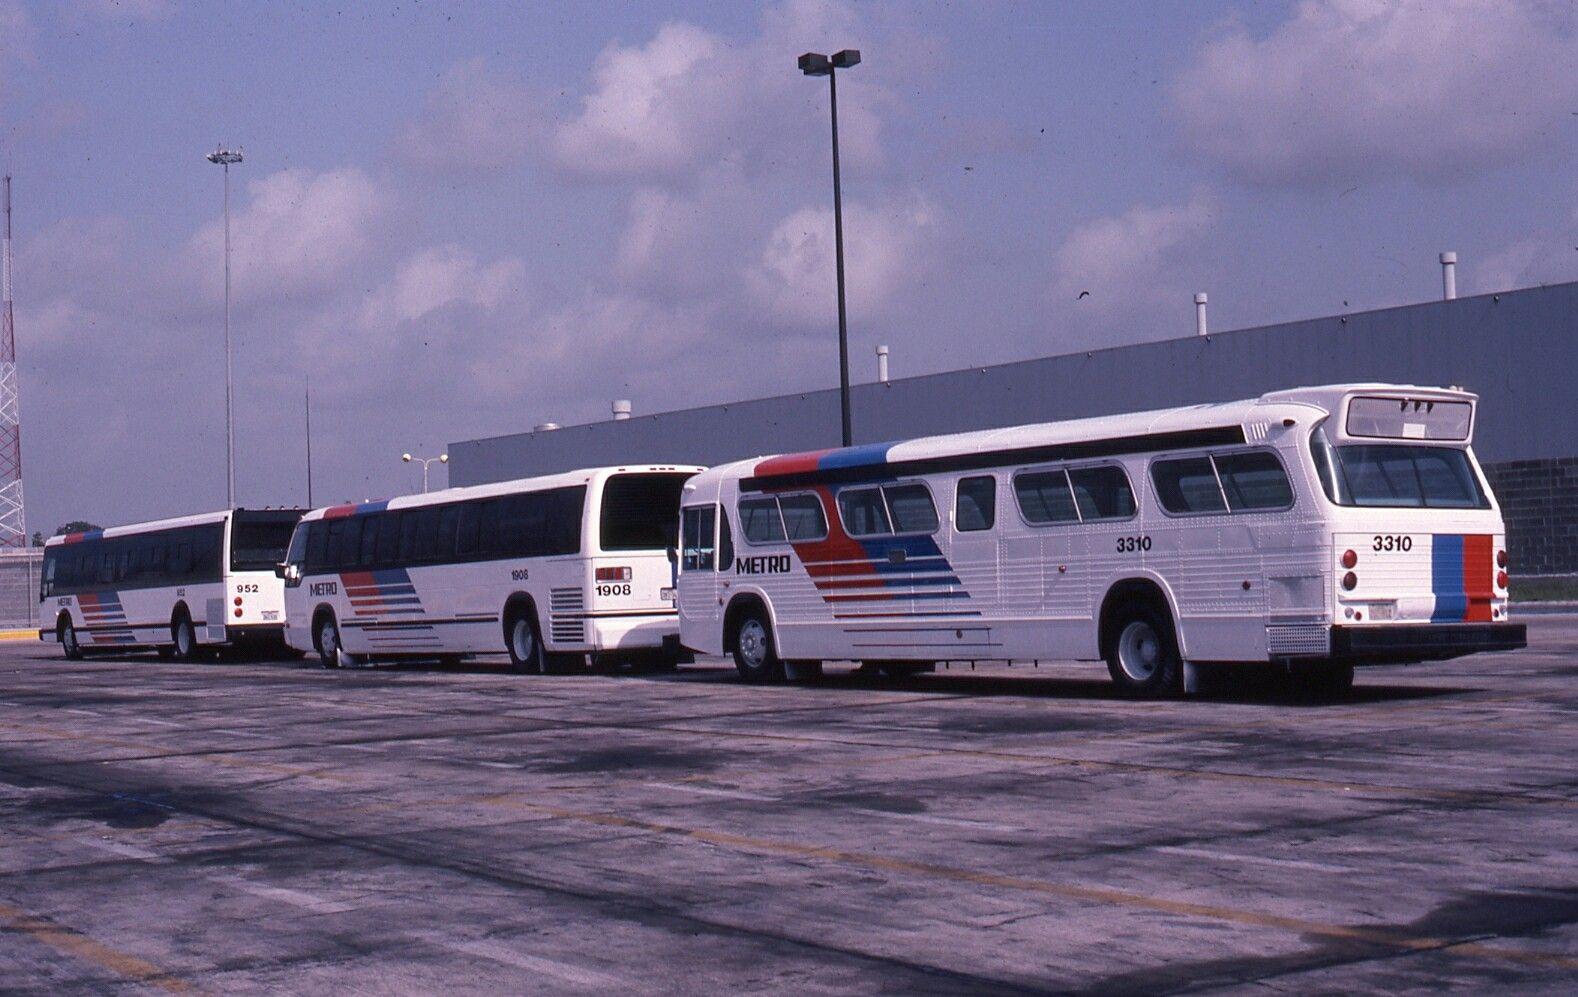 Houston Metro Gmc Fishbowl And Rts New Bus Metro Bus